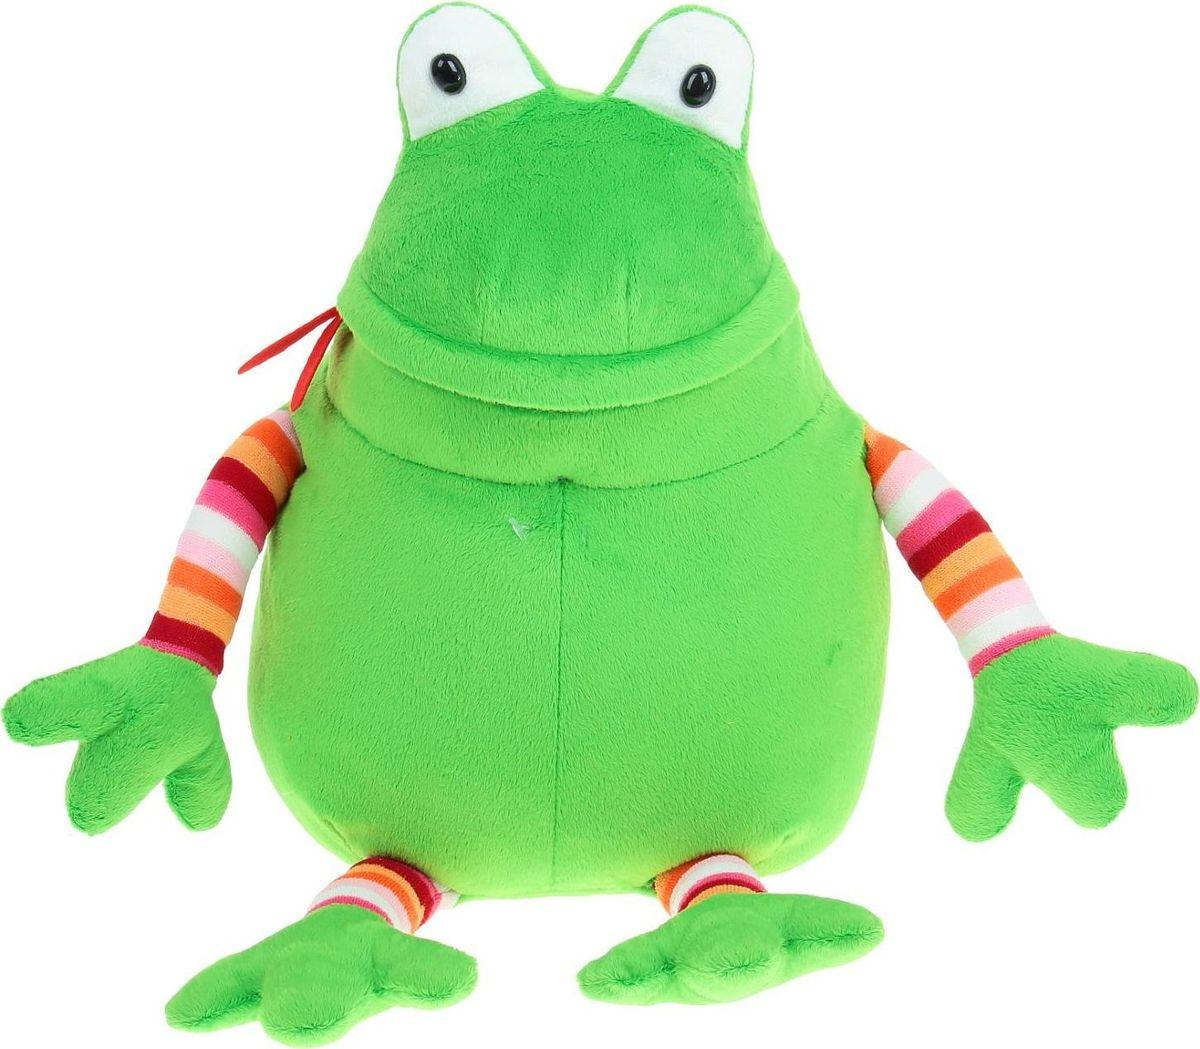 Sima-land Мягкая игрушка Лягушка Мажор 35 см - Мягкие игрушки